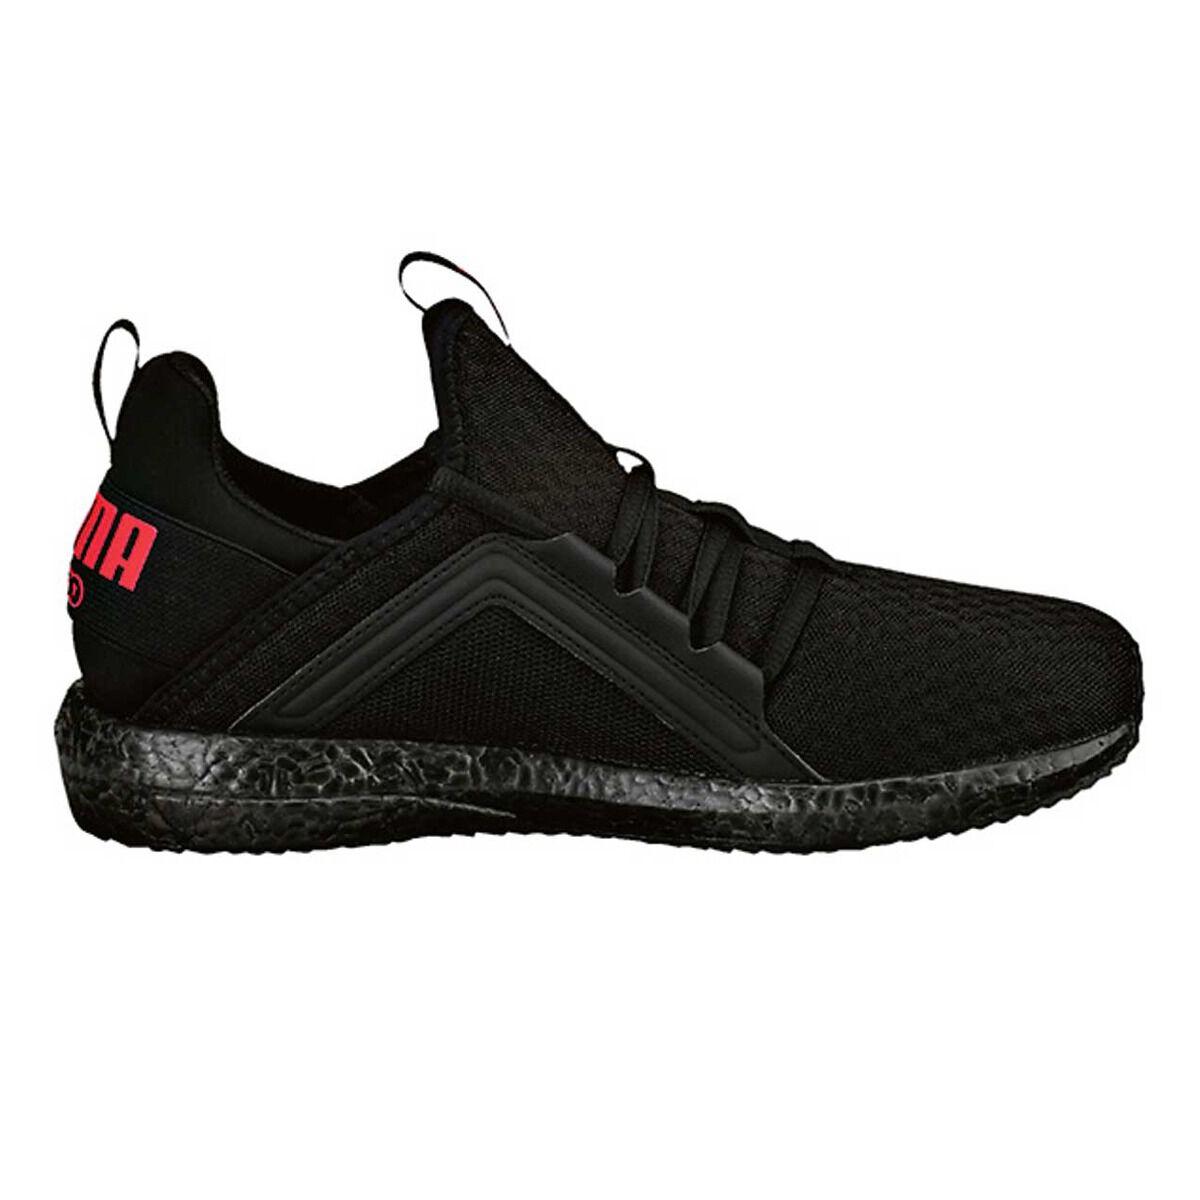 Black Sport Nrgy Puma Us Womens Shoes Pink 6Rebel Mega Running EH9WIYD2